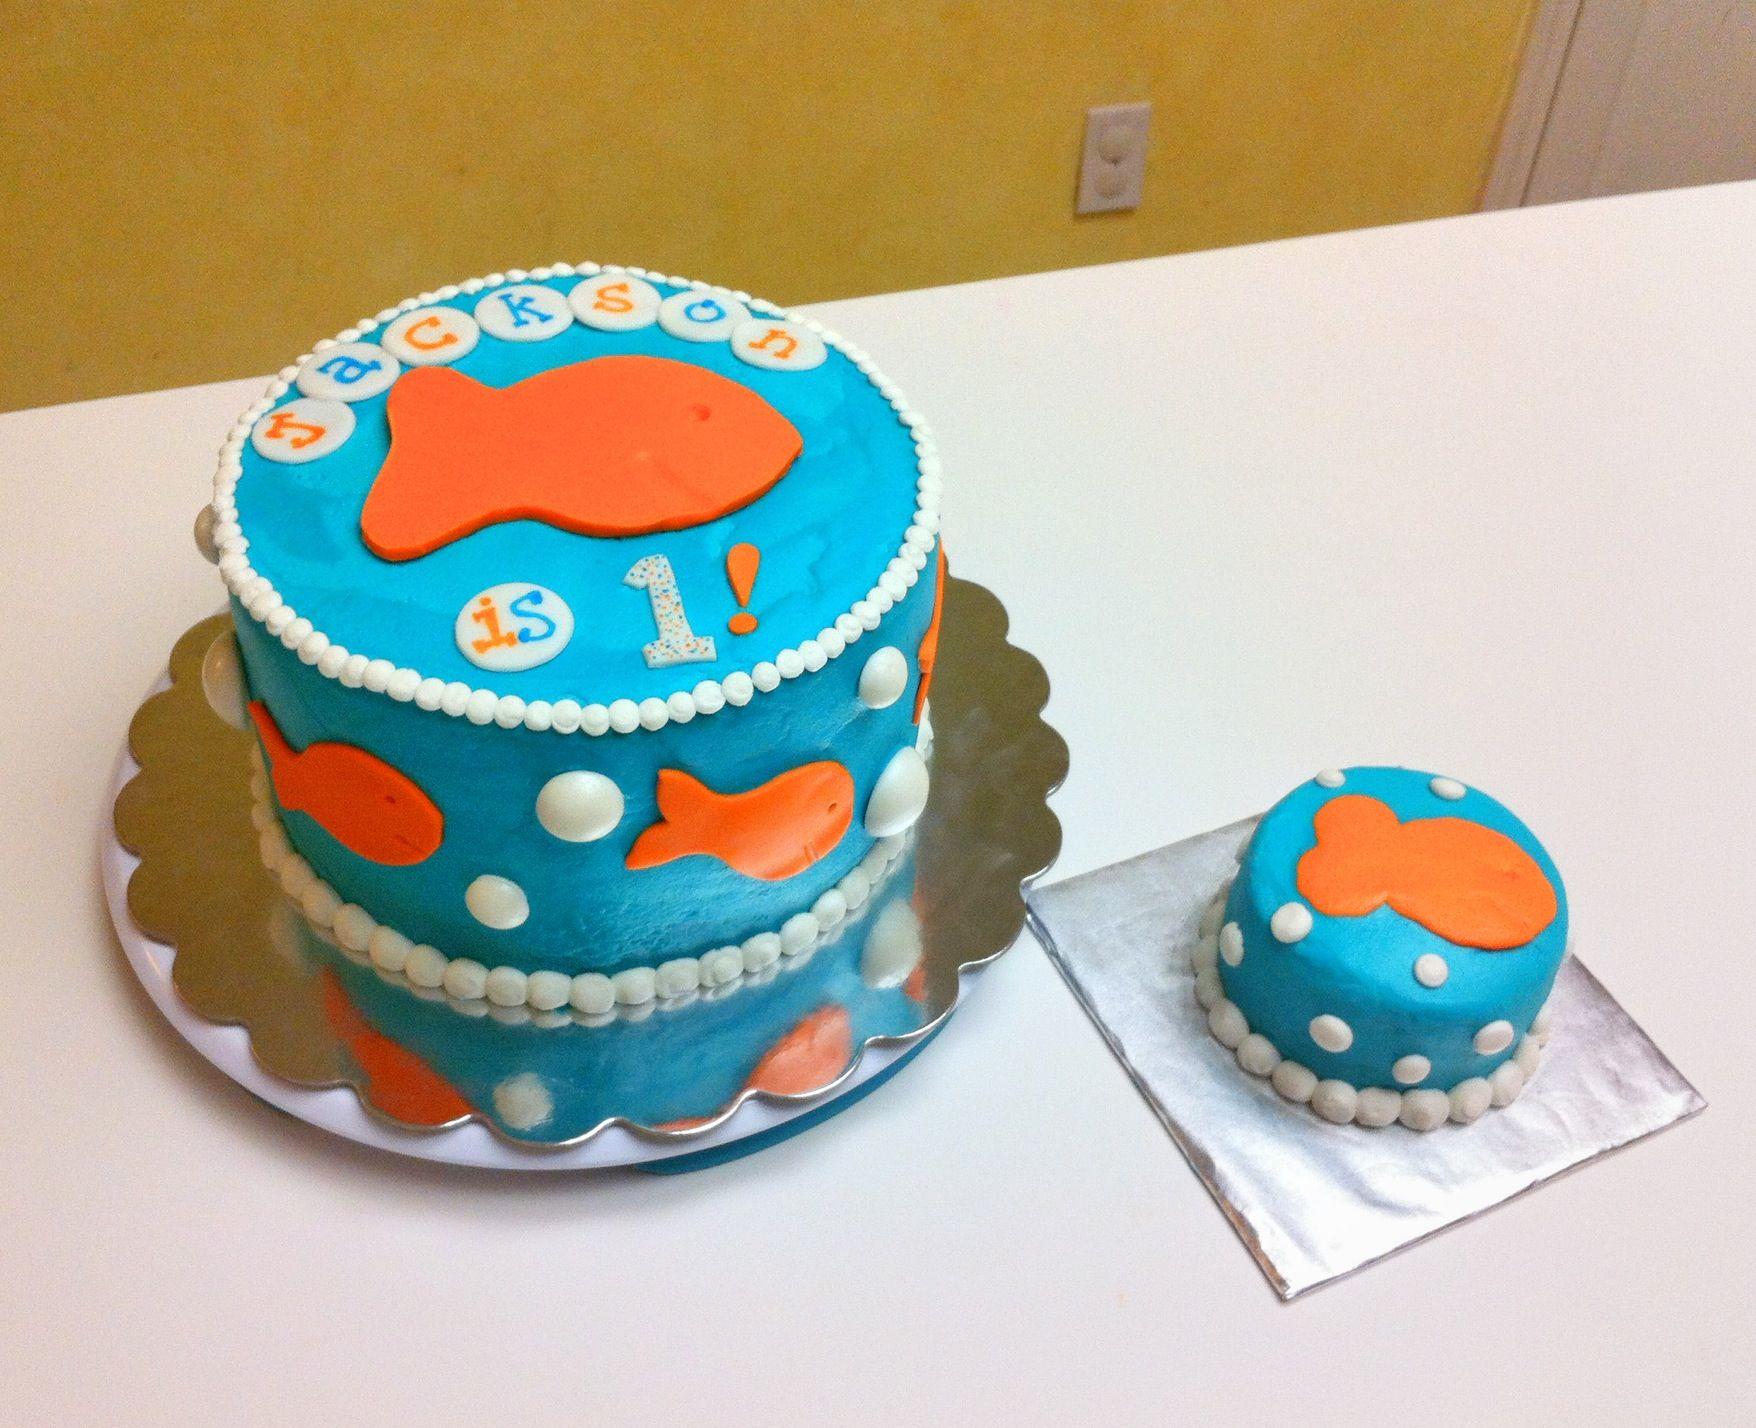 Goldfish cracker themed first birthday cake and matching smash